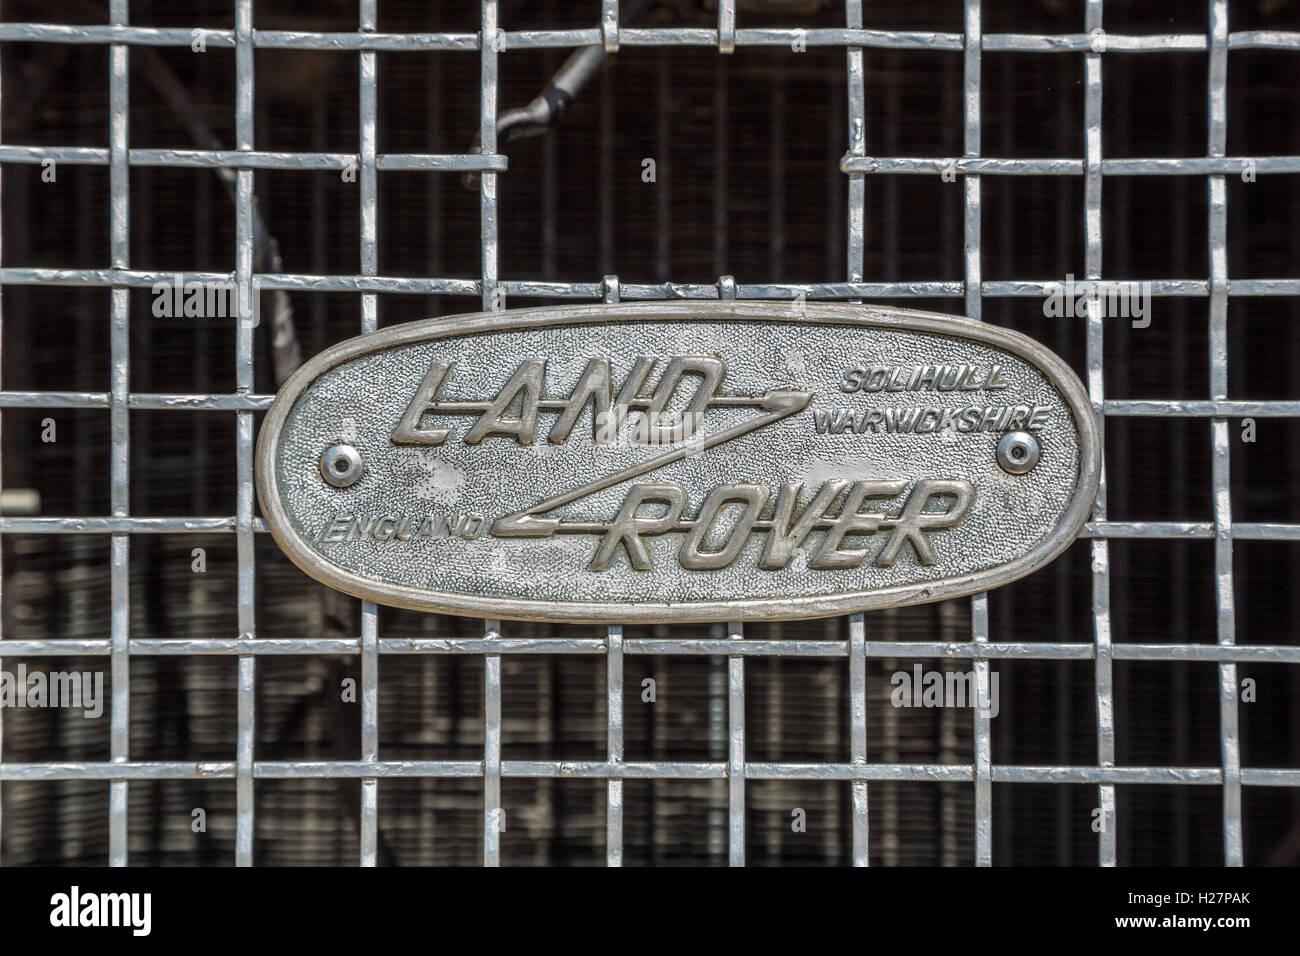 KIEV, UKRAINE - April 26, 2015: The Retro OldCarFest in Kiev. Retro logo Land Rover closeup on a radiator. - Stock Image